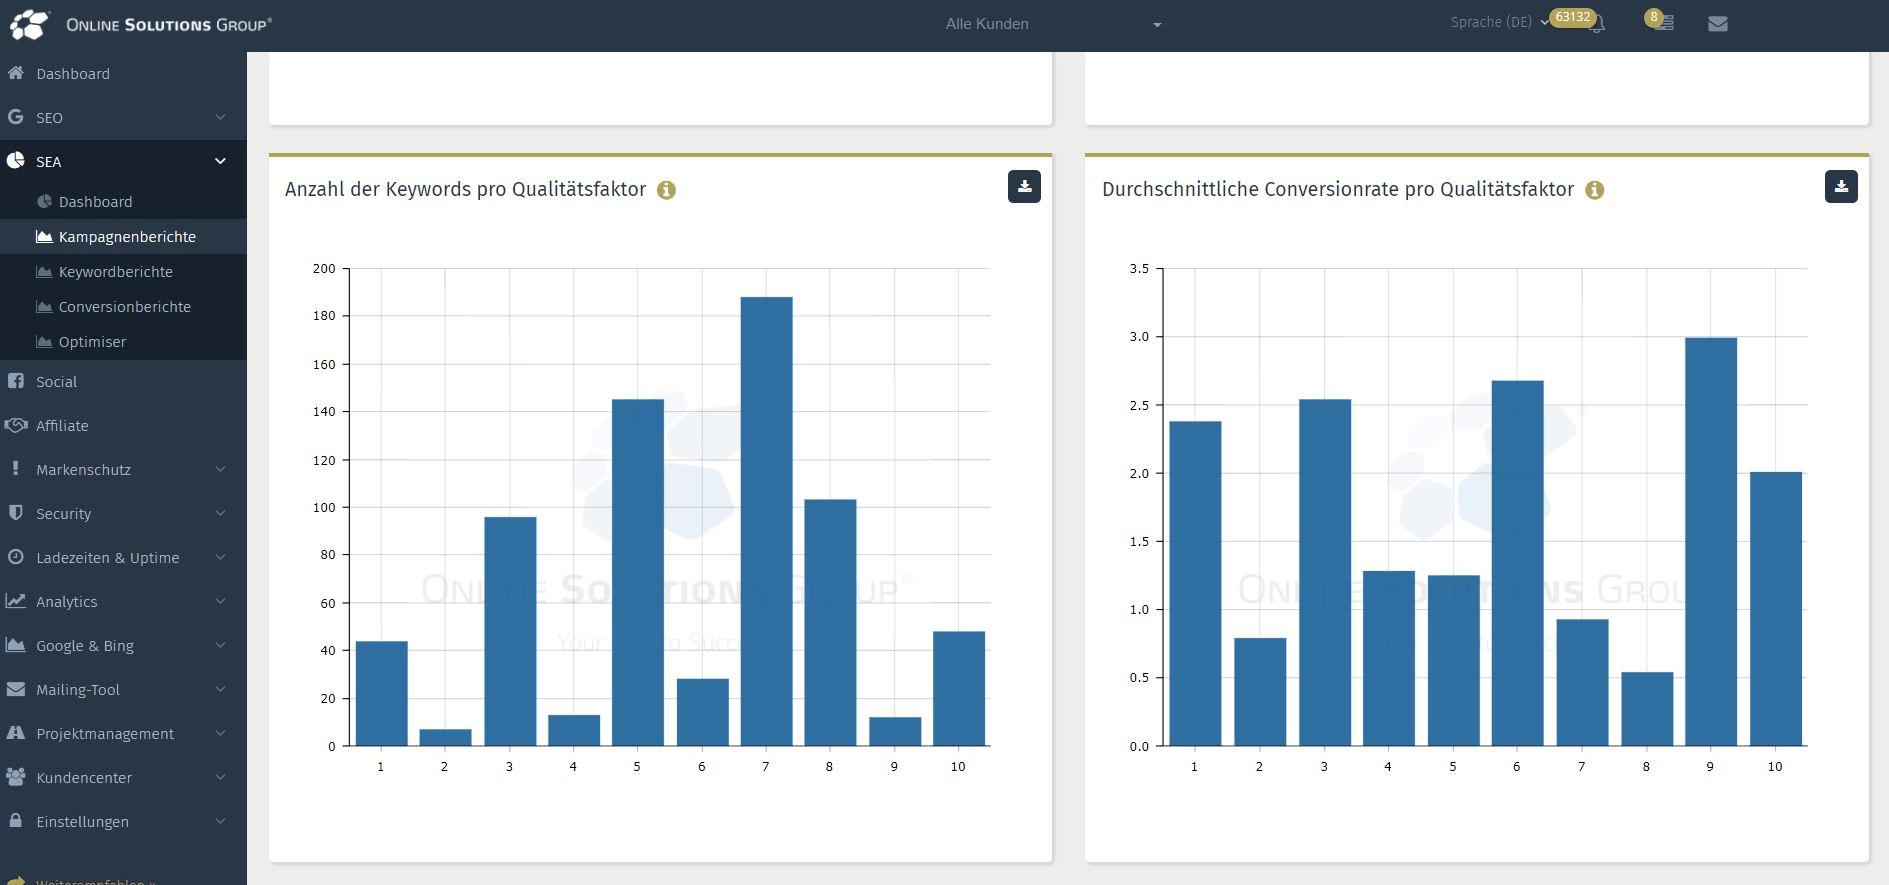 SEA Tool in der Performance Suite: ANzahl der Keywords